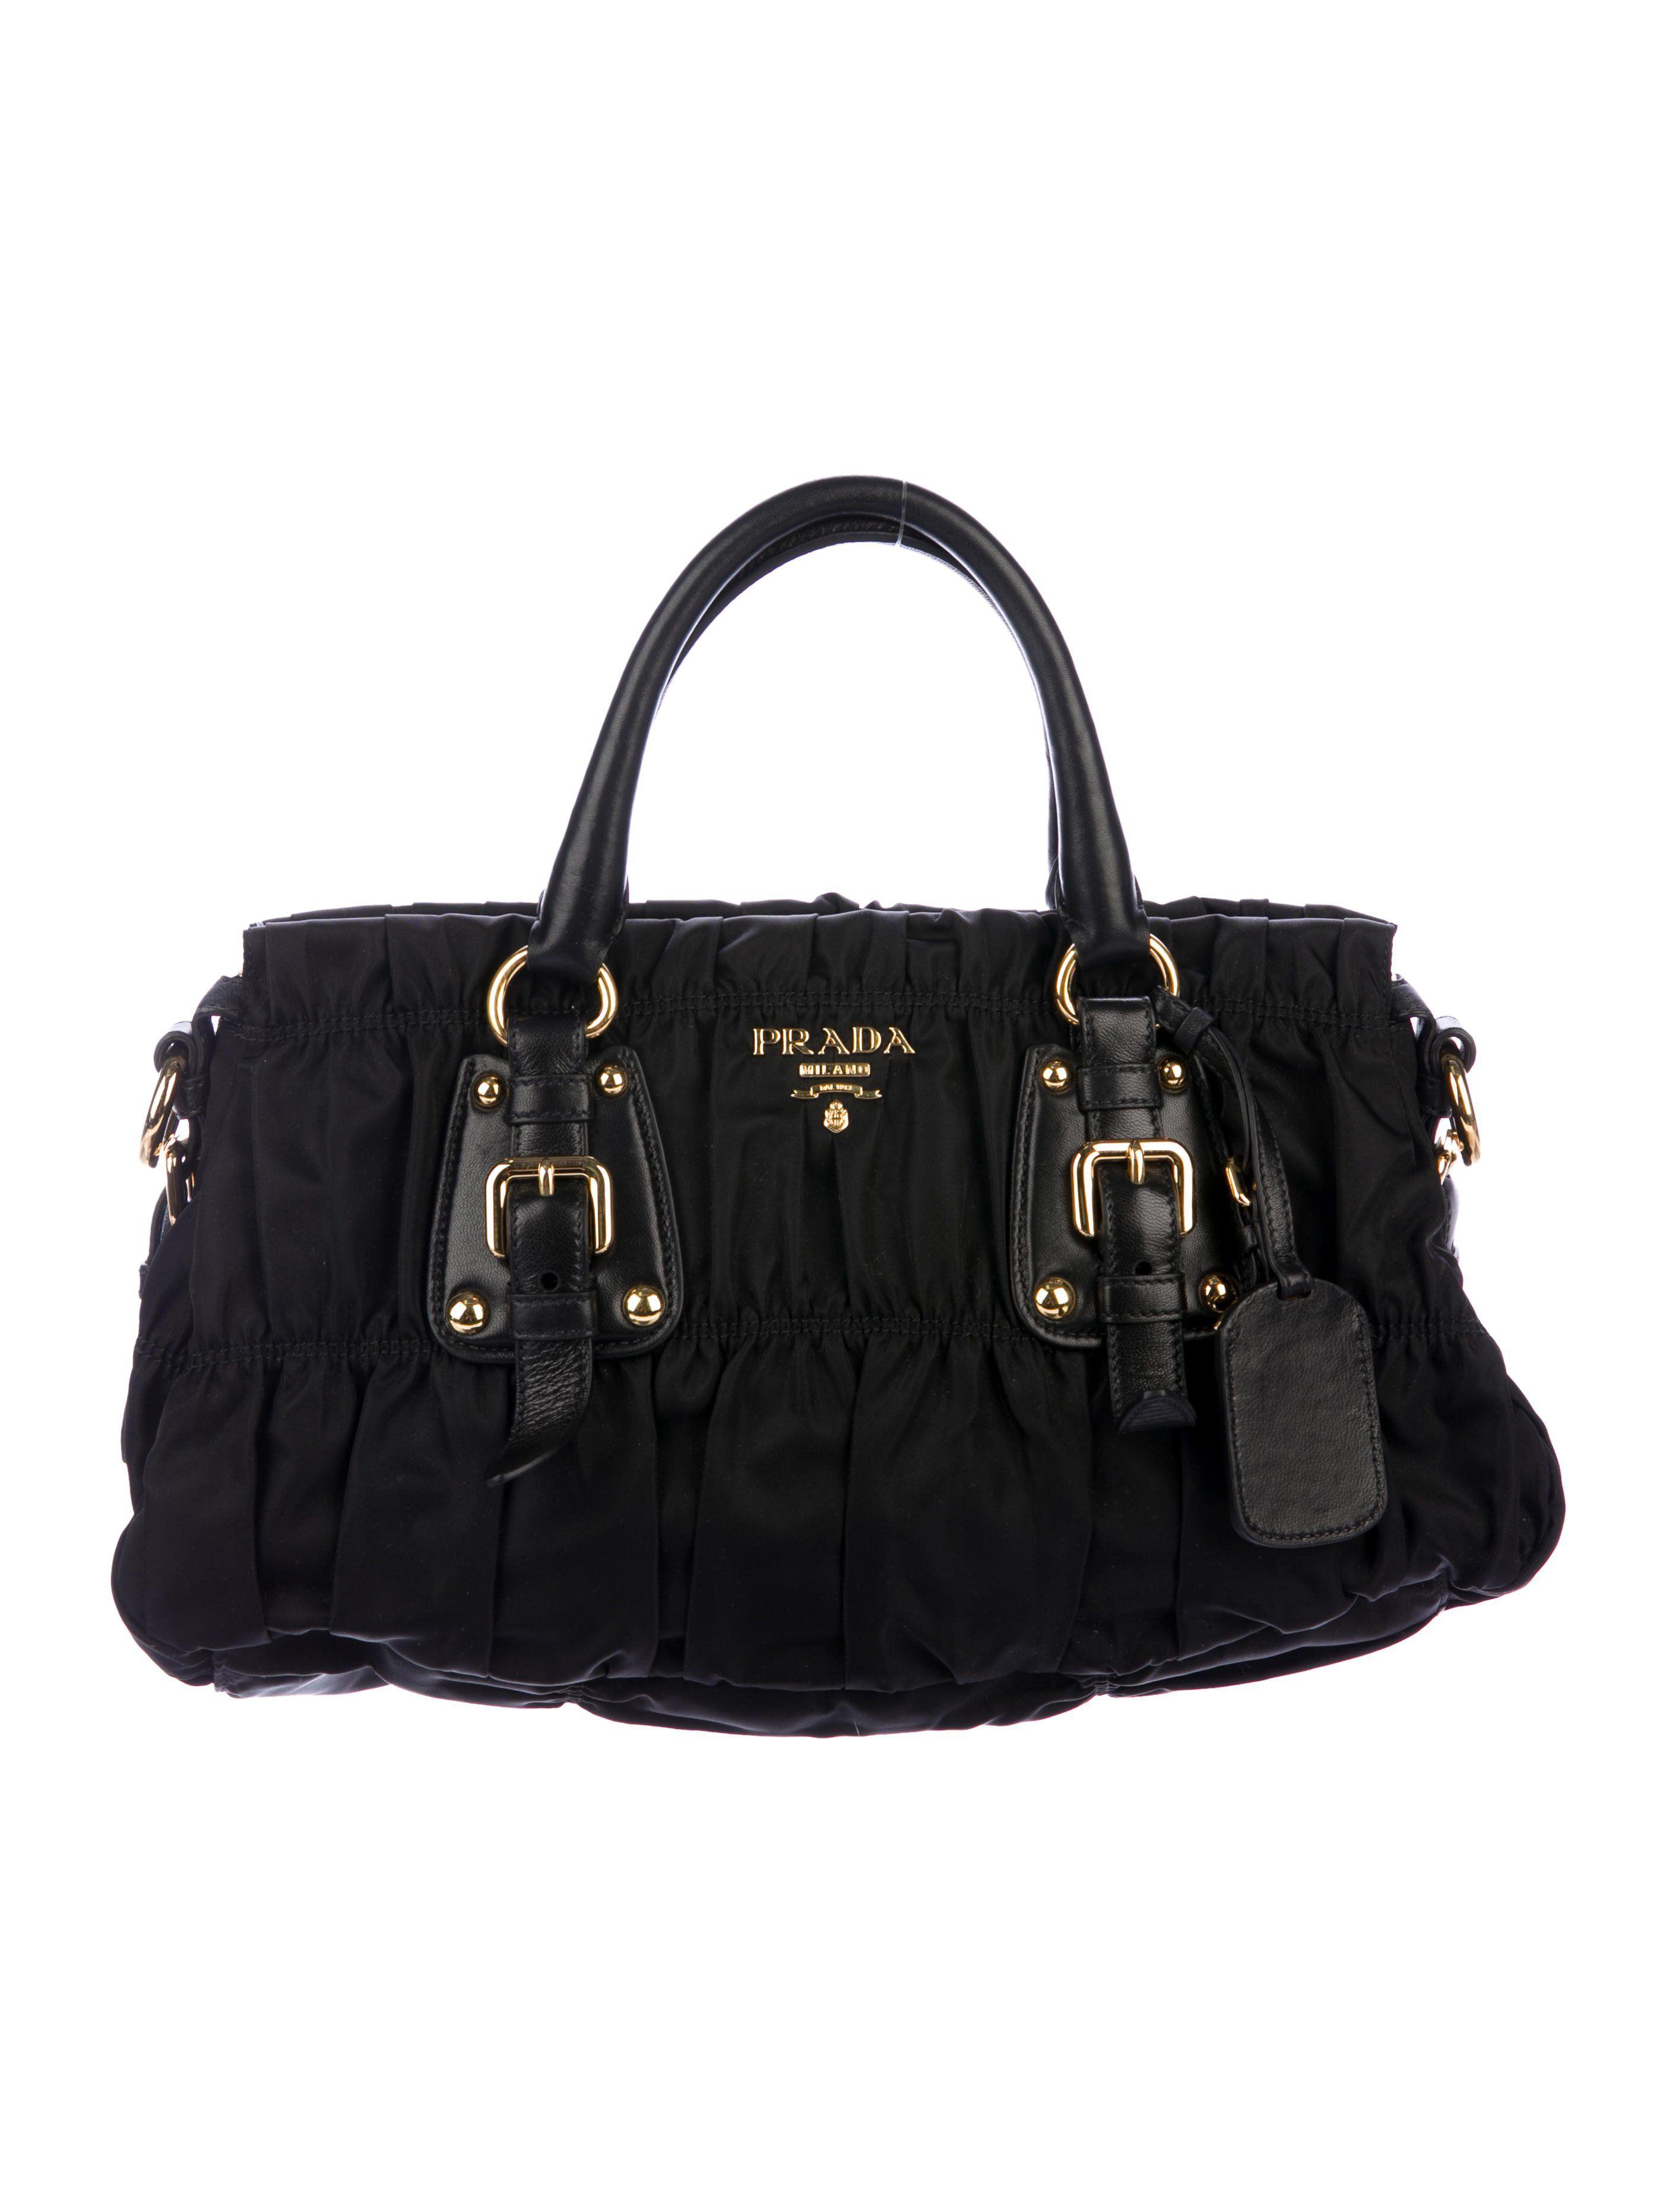 363cea16e2c3 Tessuto Gaufre Satchel | Fashion Favorites | Satchel, Prada tessuto ...